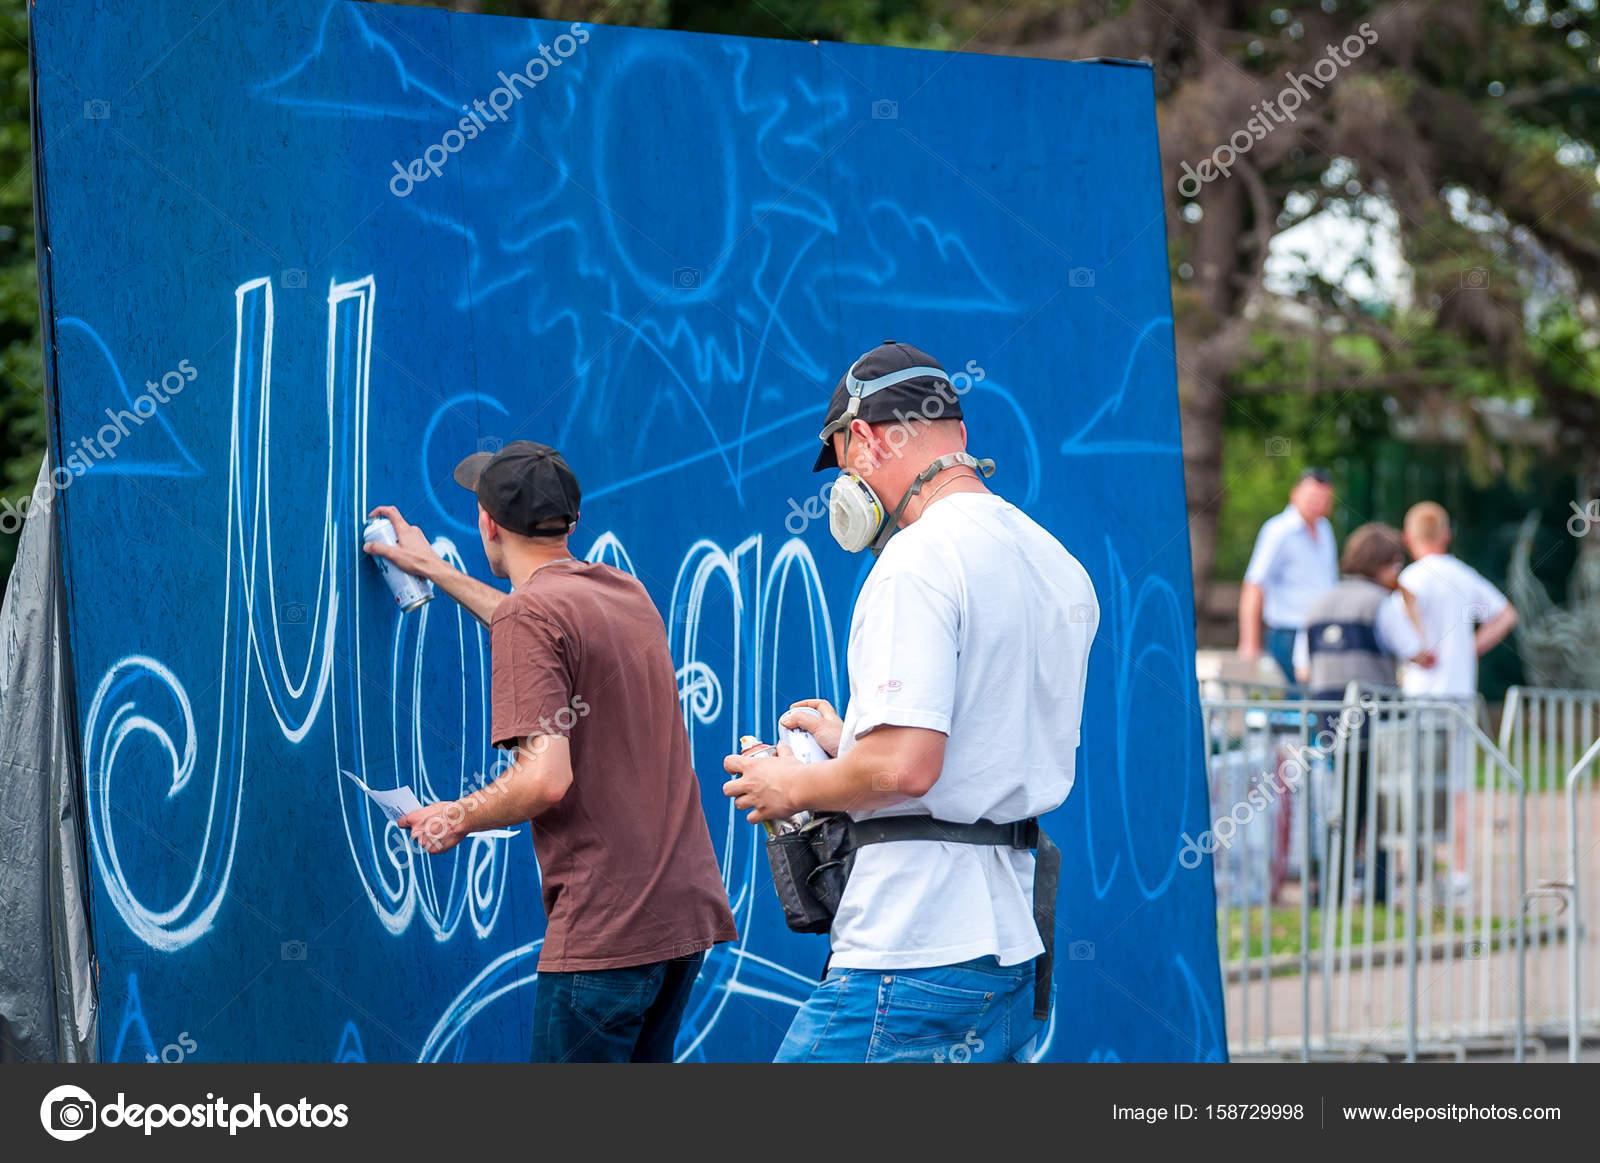 Ukraine, Nikolaev, 24.06.2017: Festival des Graffiti, der Tag der ...